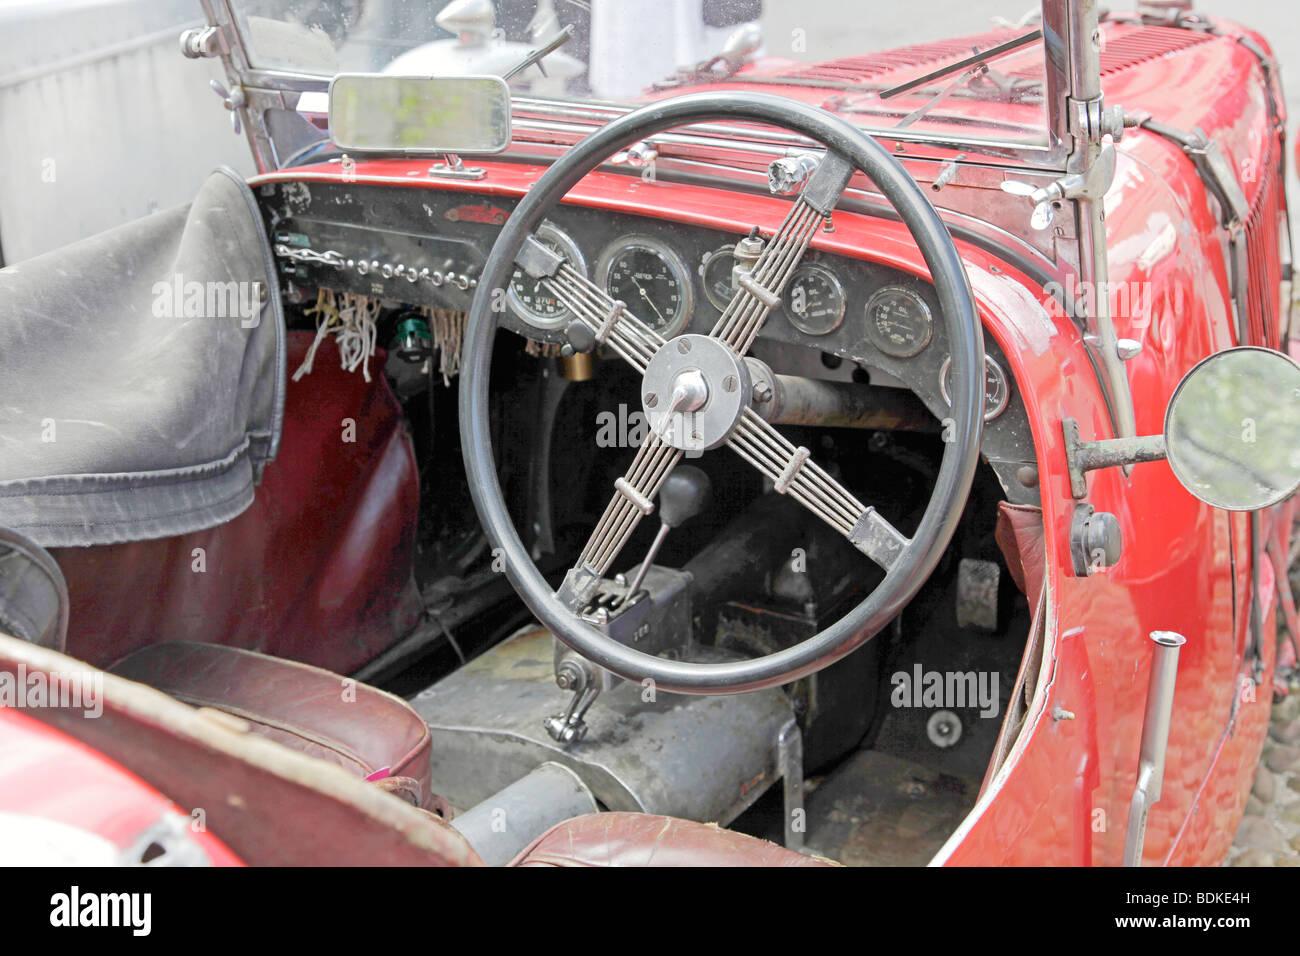 Interior Of An Unrestored Aston Martin Ulster Racing Car Stock Photo Alamy